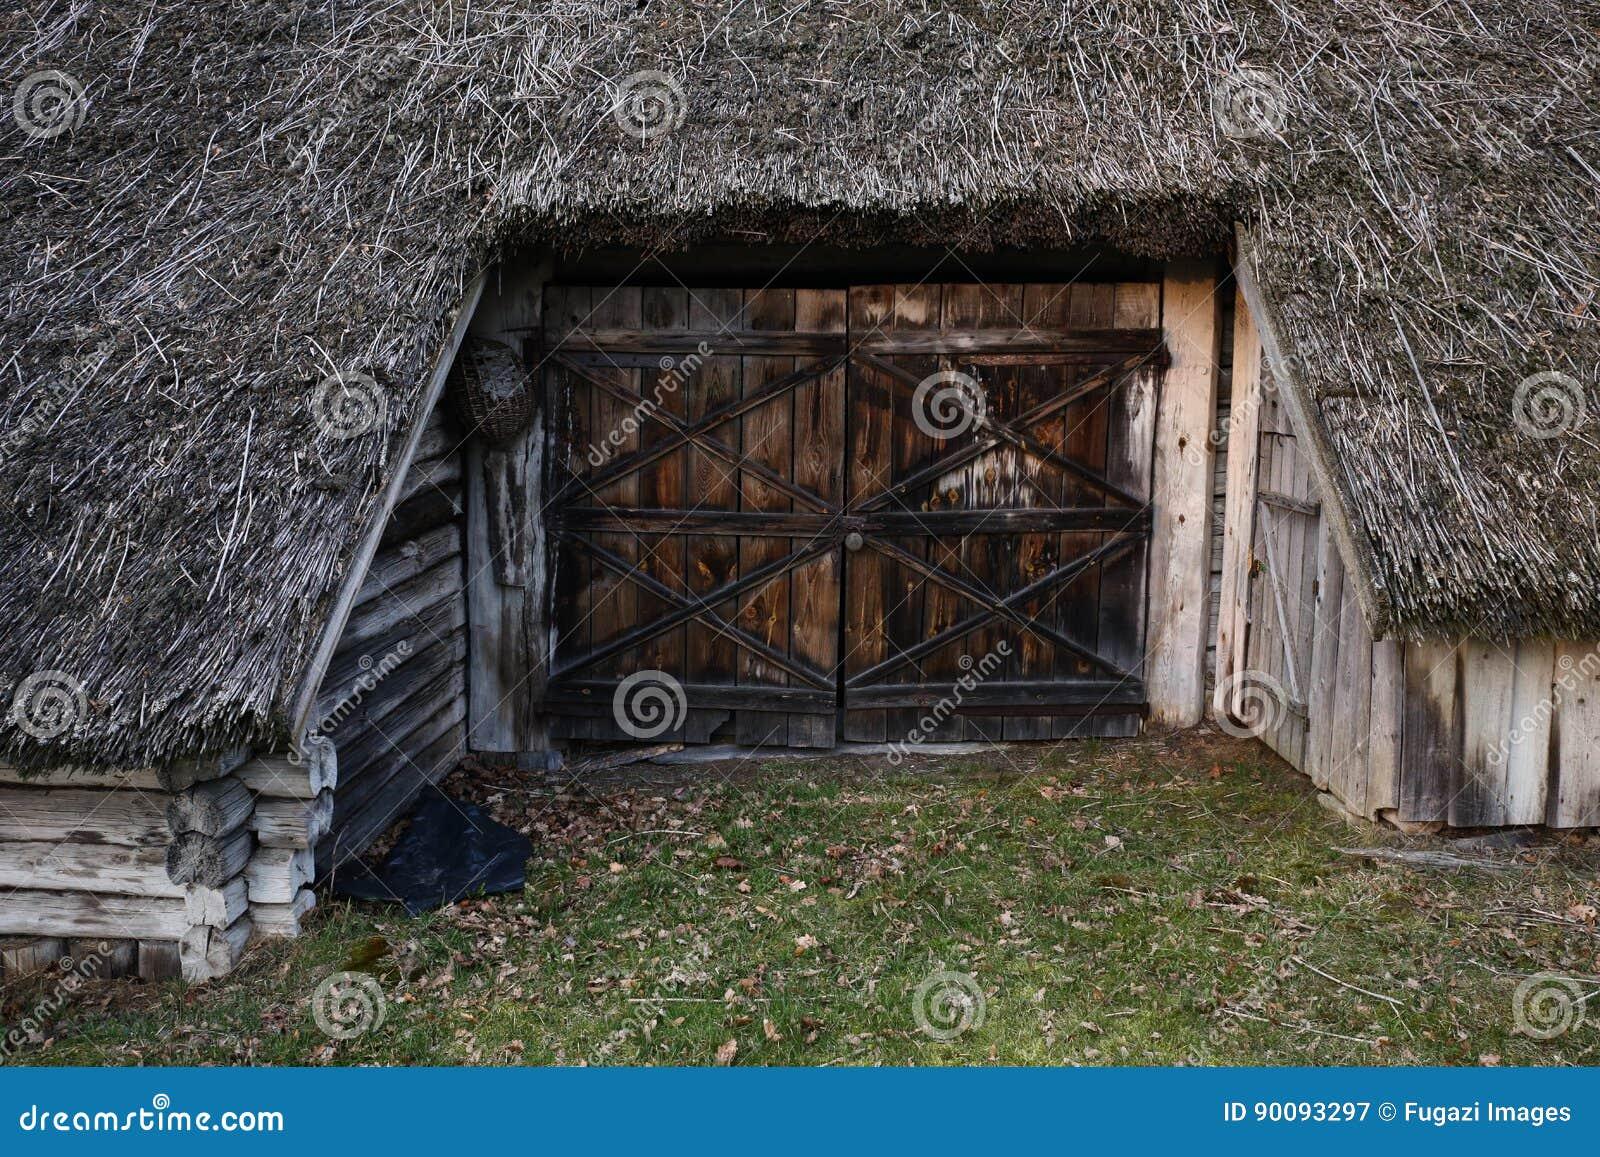 Vieille porte d 39 entr e en bois la vieille maison for Vieille porte en bois